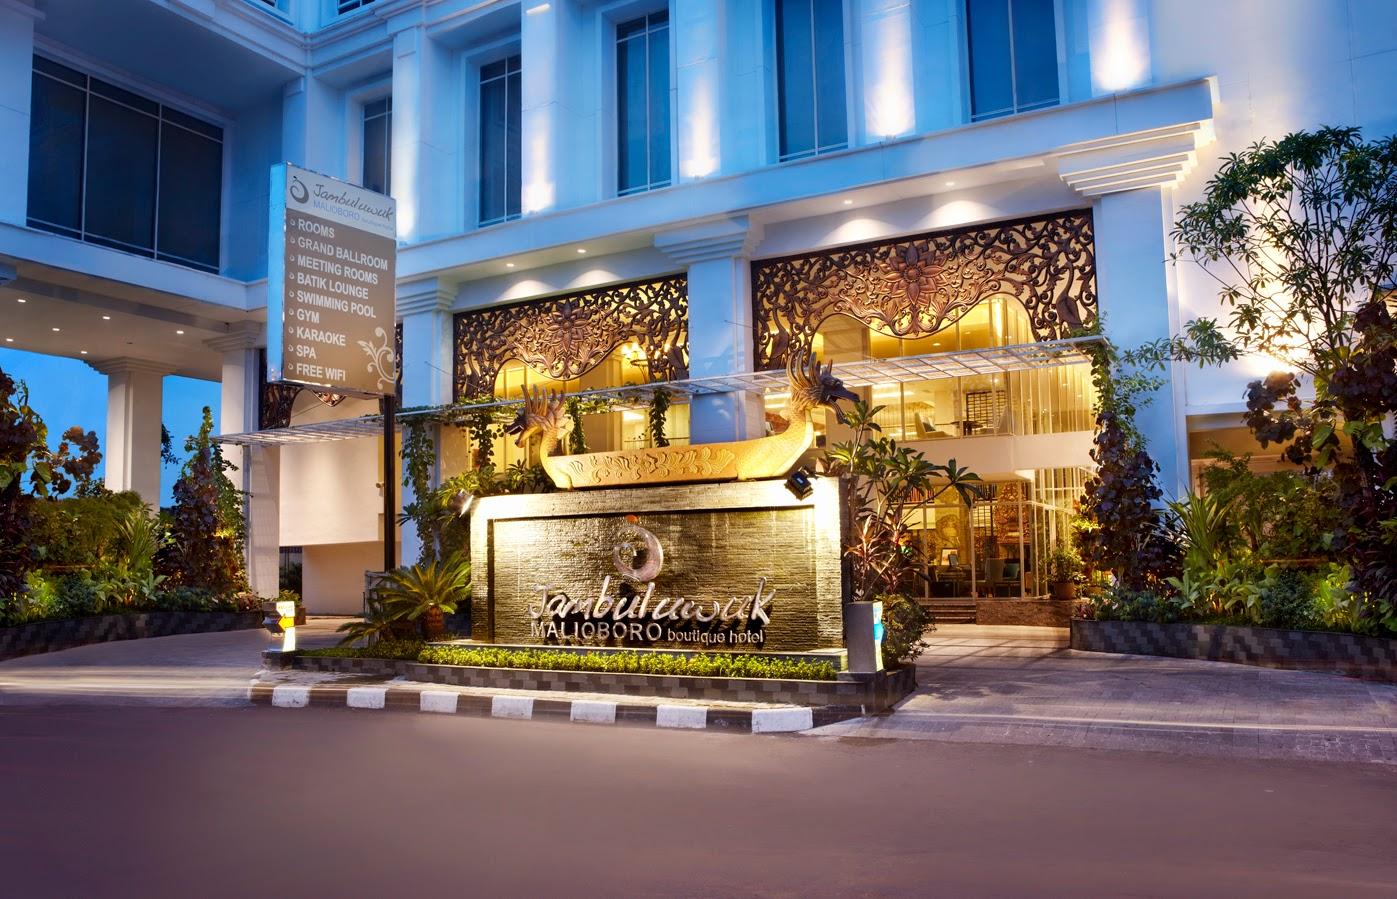 Daftar Hotel Murah Di Jogja